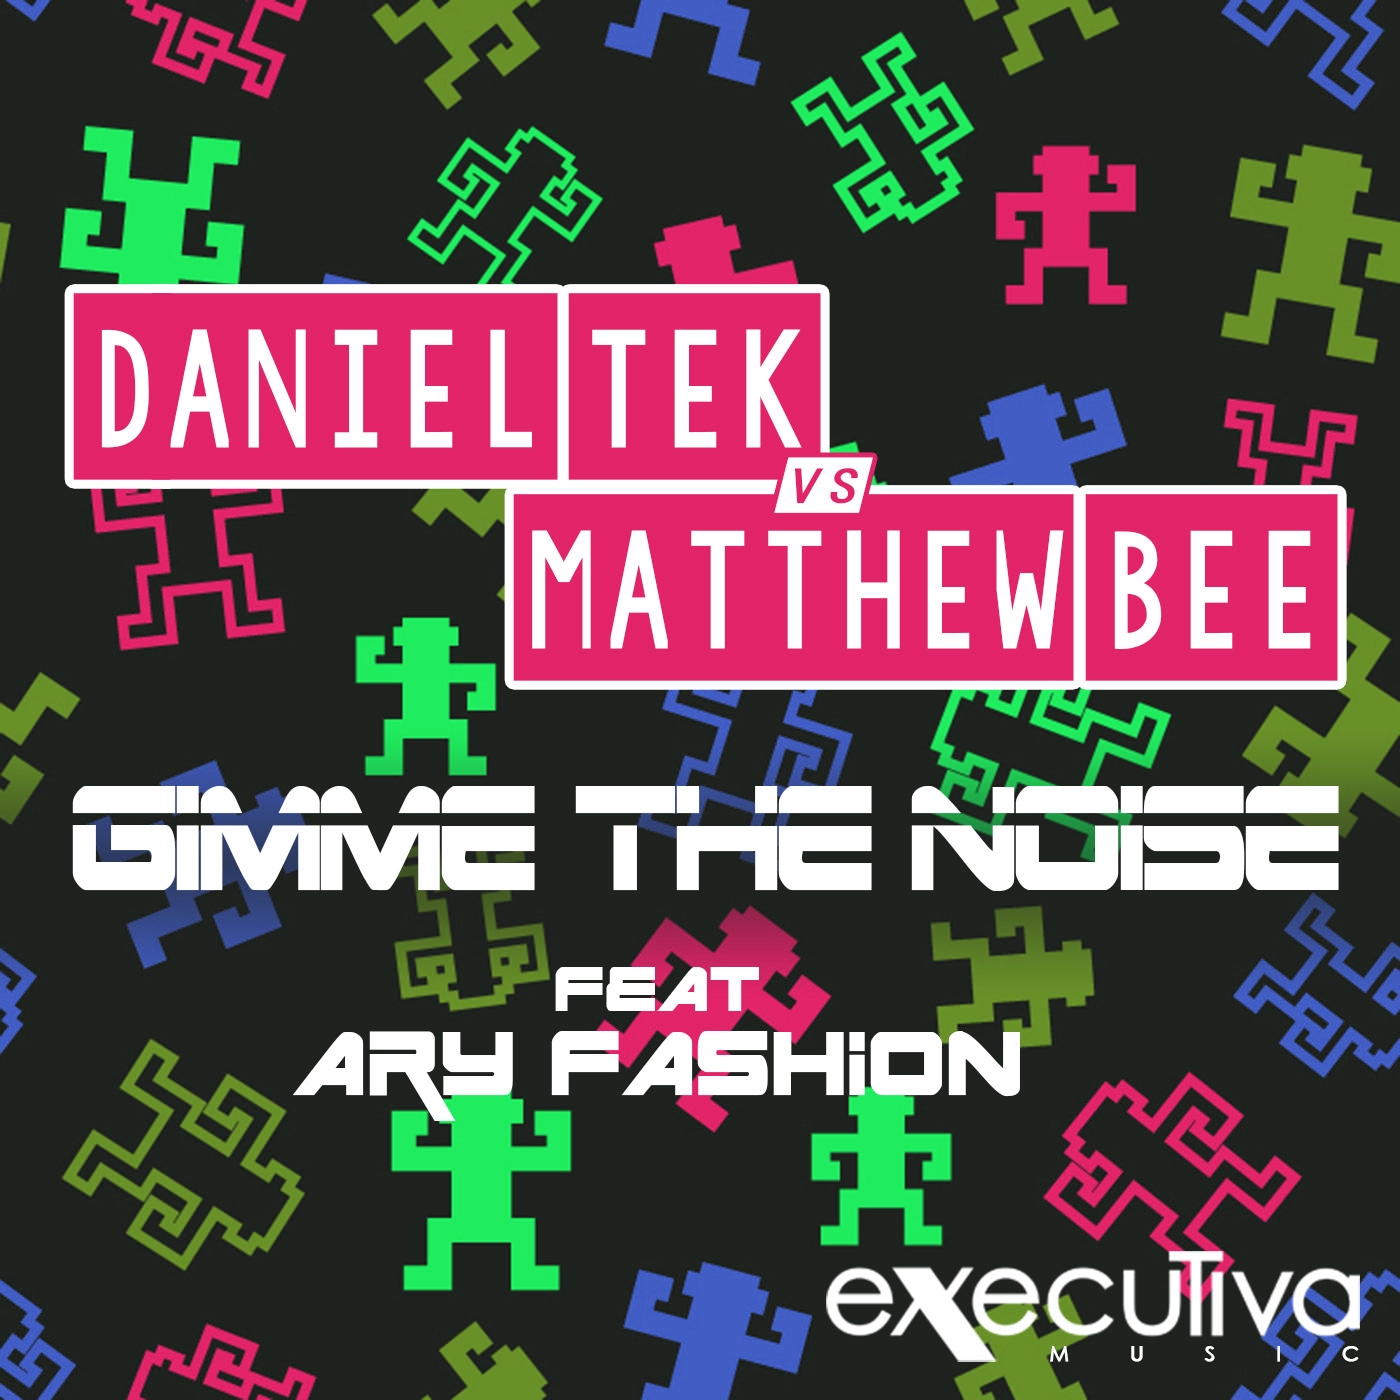 Daniel Tek & Matthew Bee - Gimme The Noise Feat. AryFashion (Myo Remix)